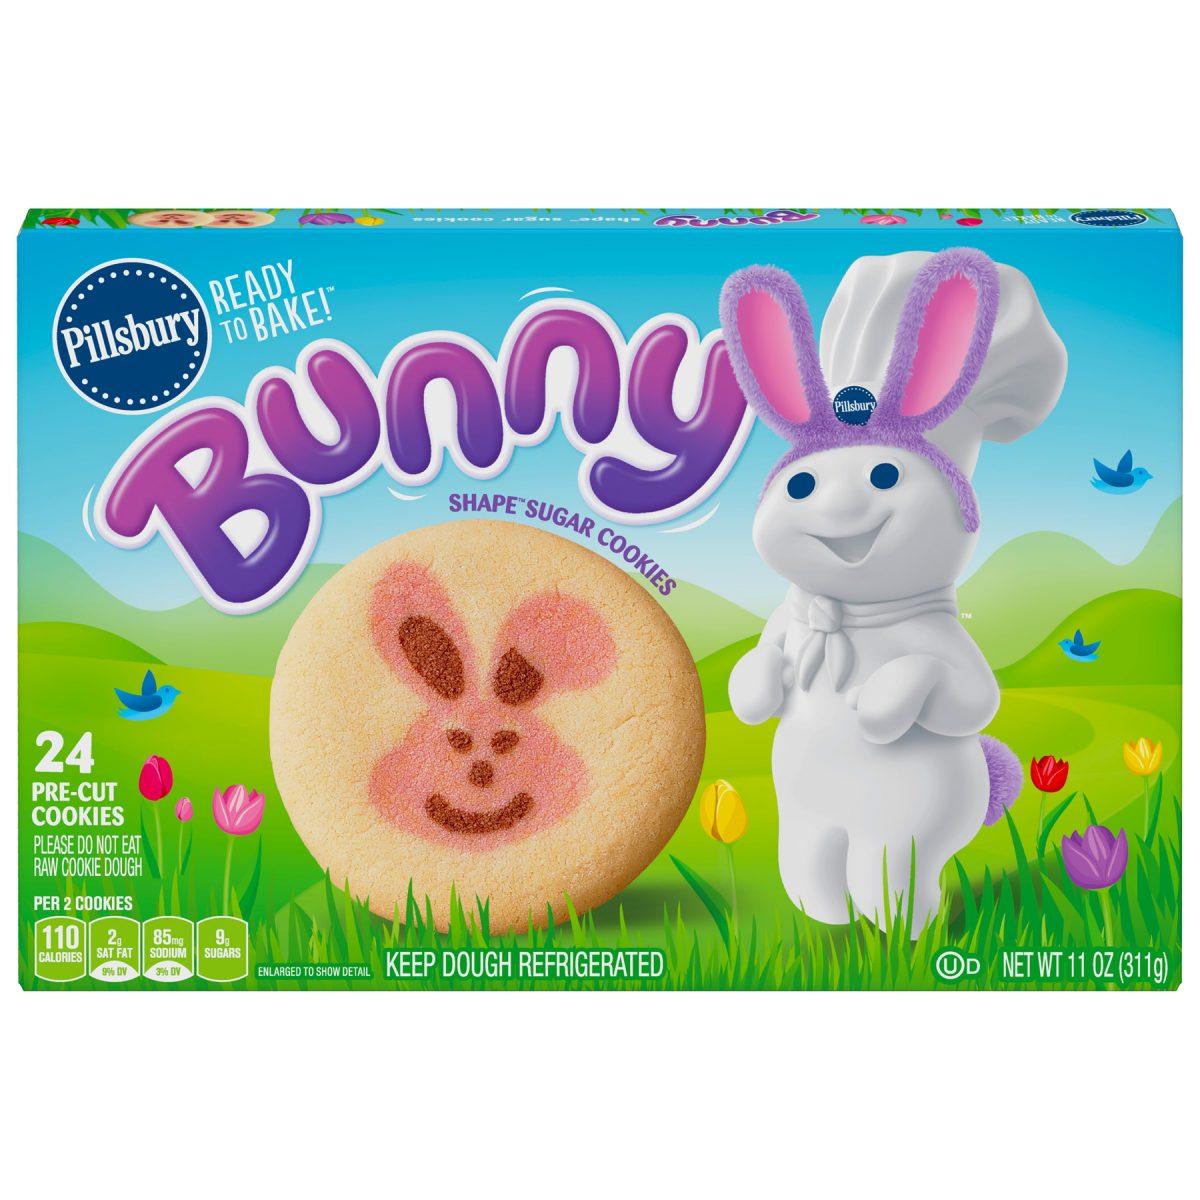 Pillsbury Bunny